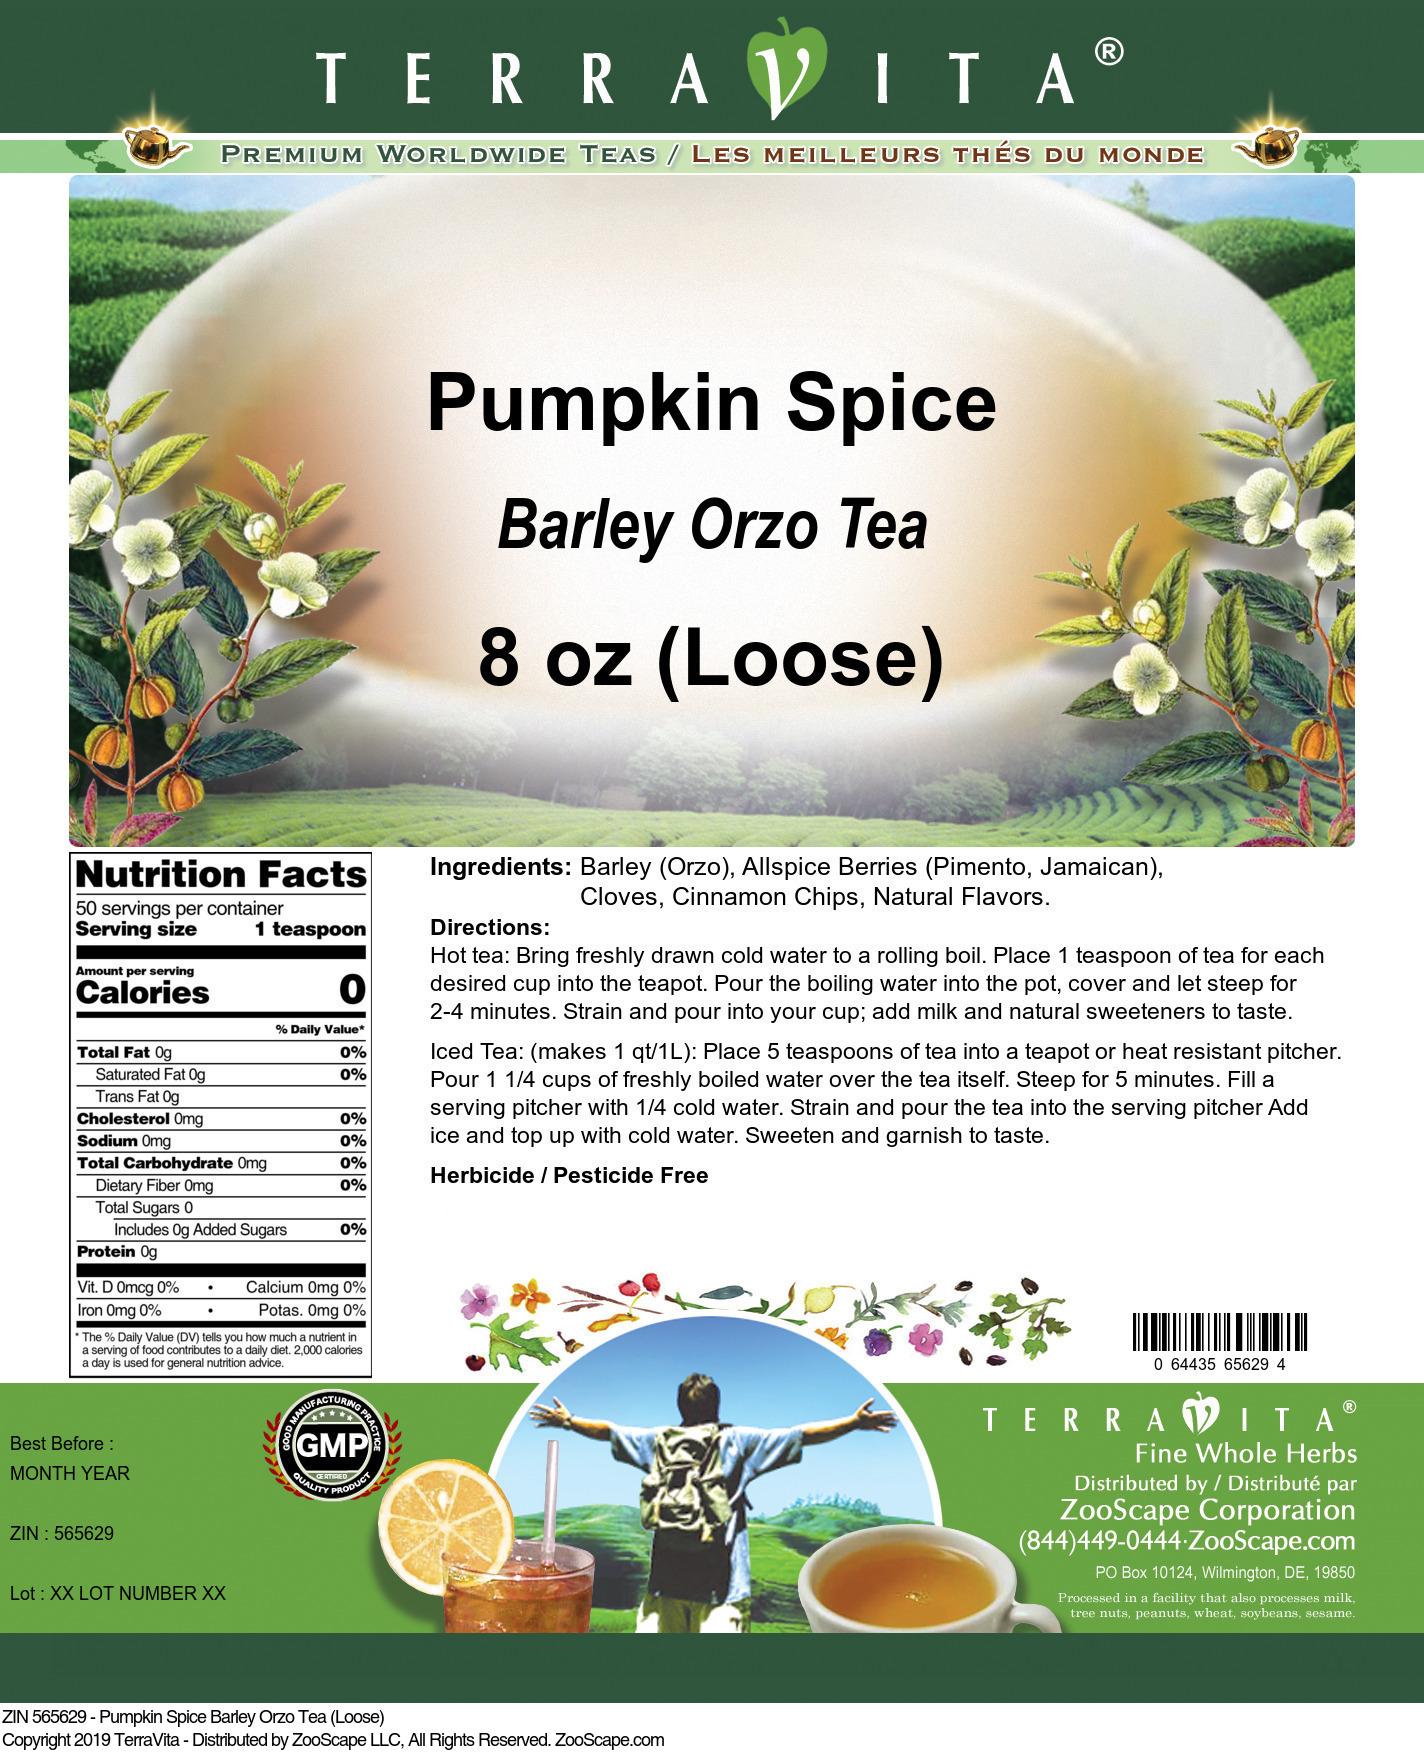 Pumpkin Spice Barley Orzo Tea (Loose)